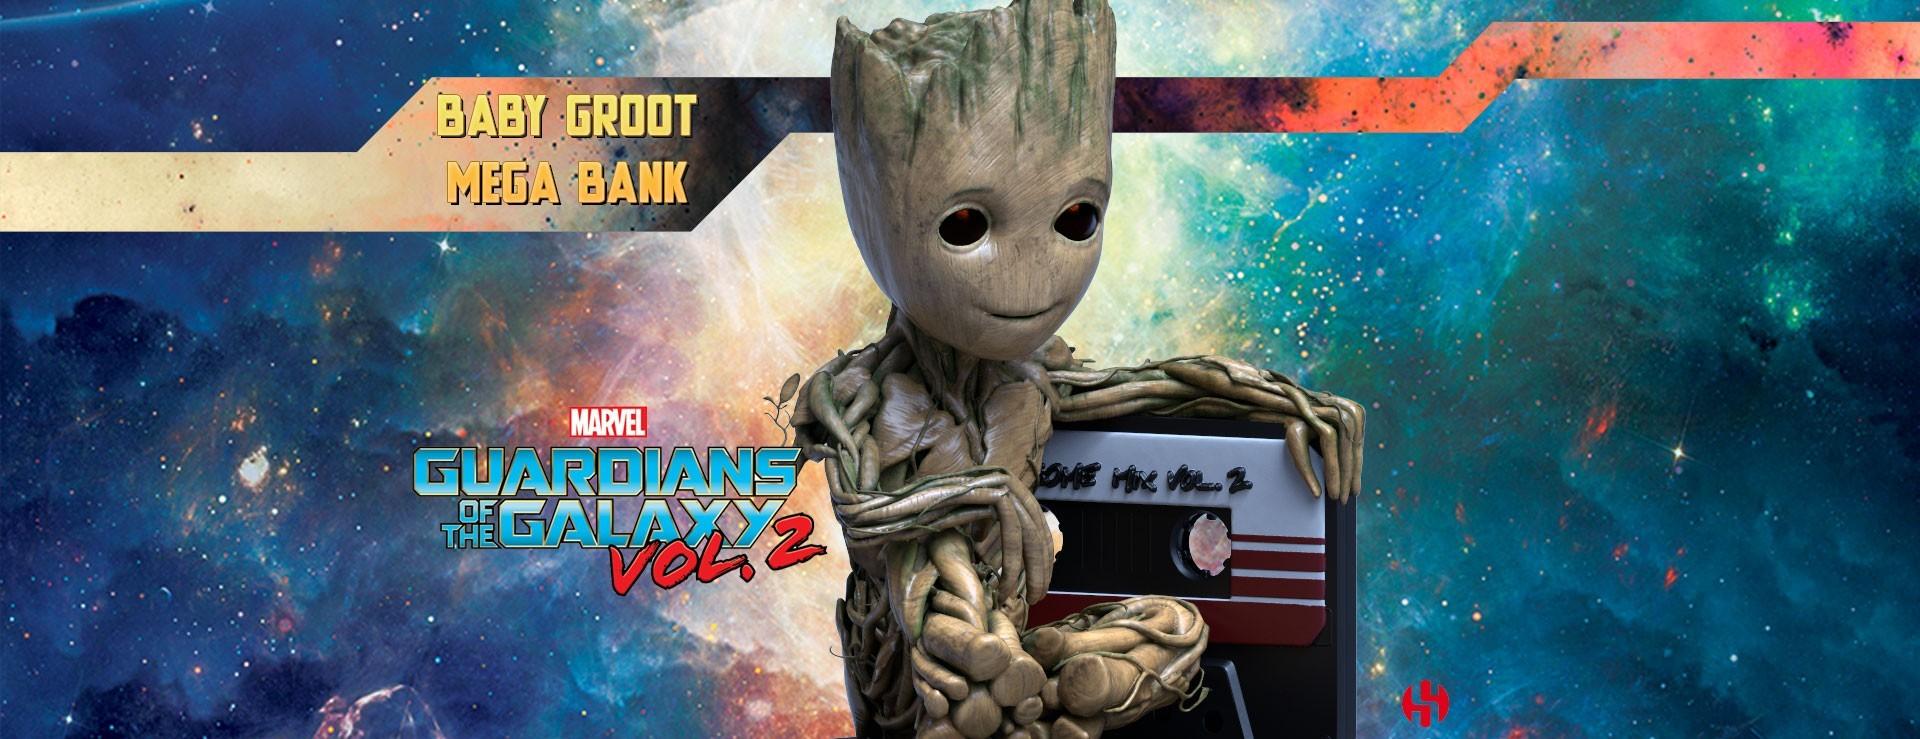 Baby Groot Mega Bank